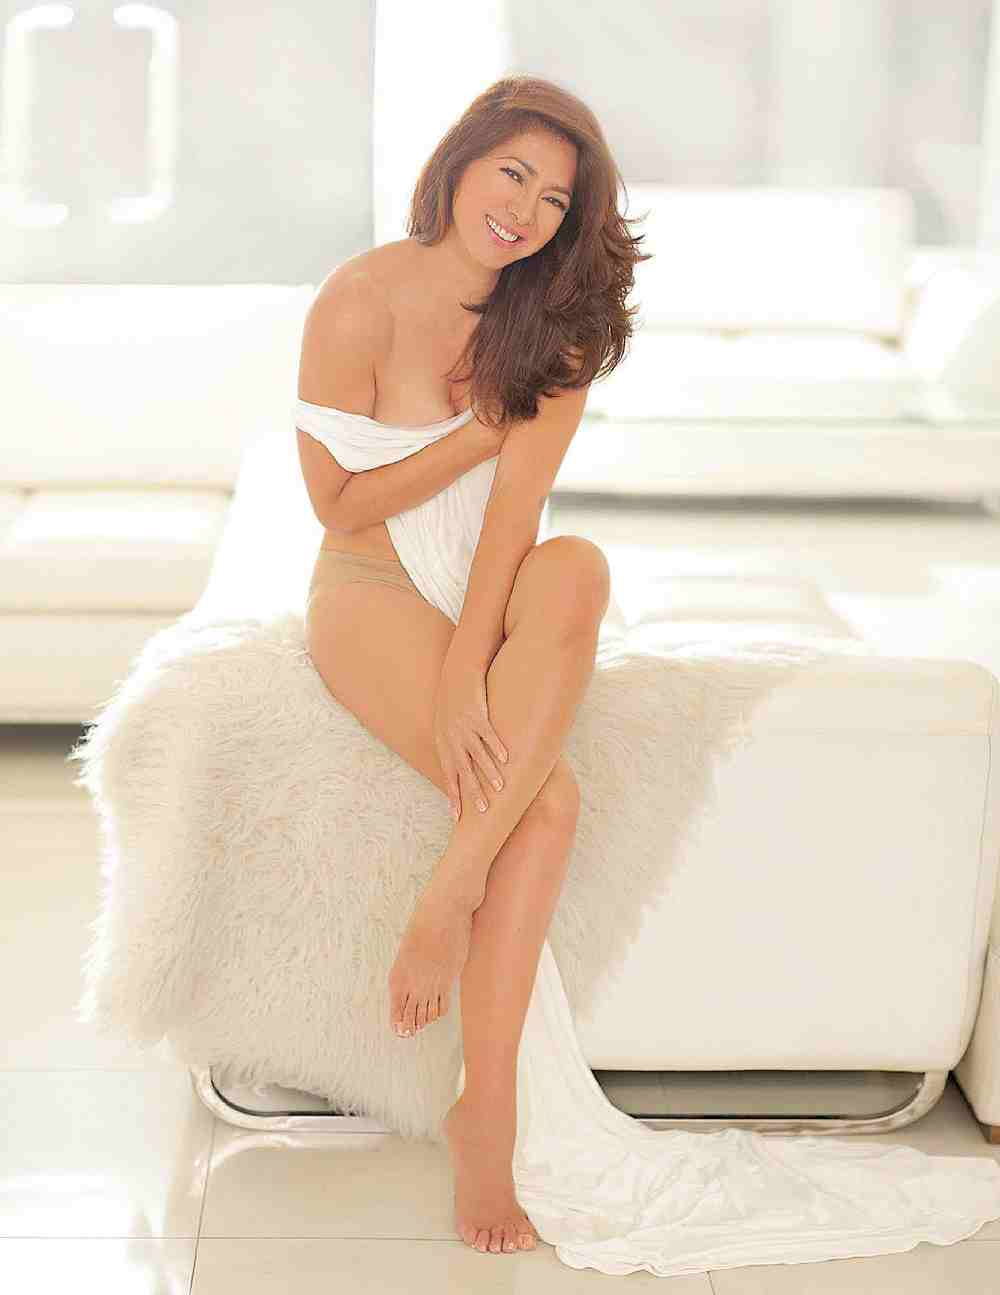 Nude Phillipine 18